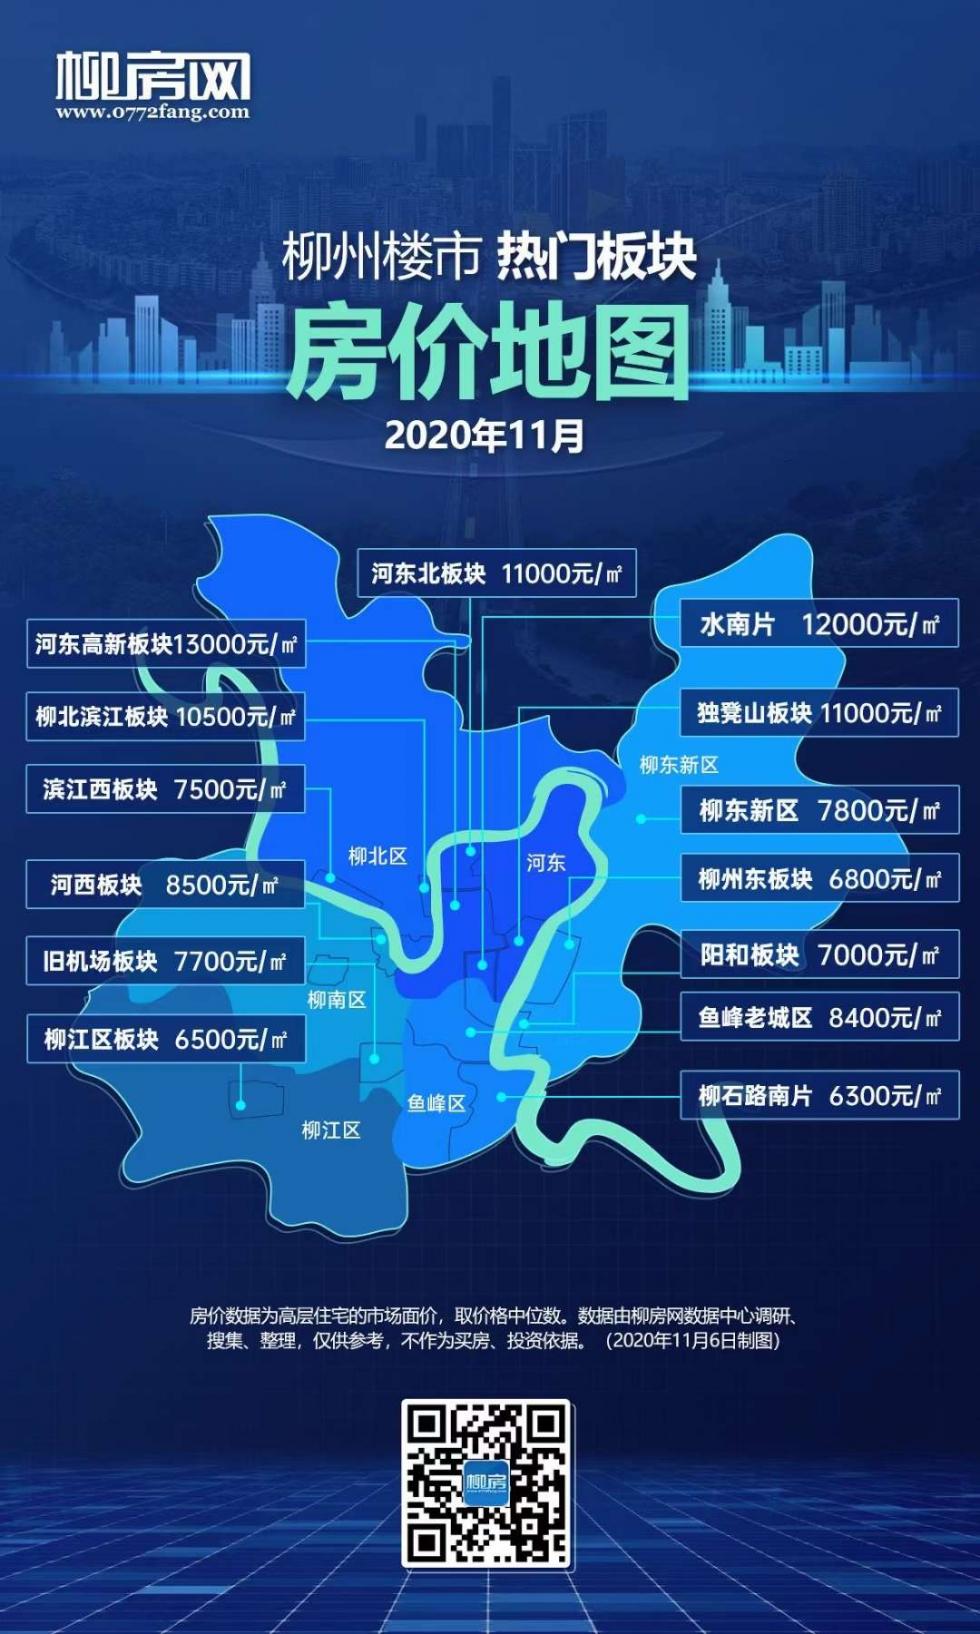 11月房价地图.jpg